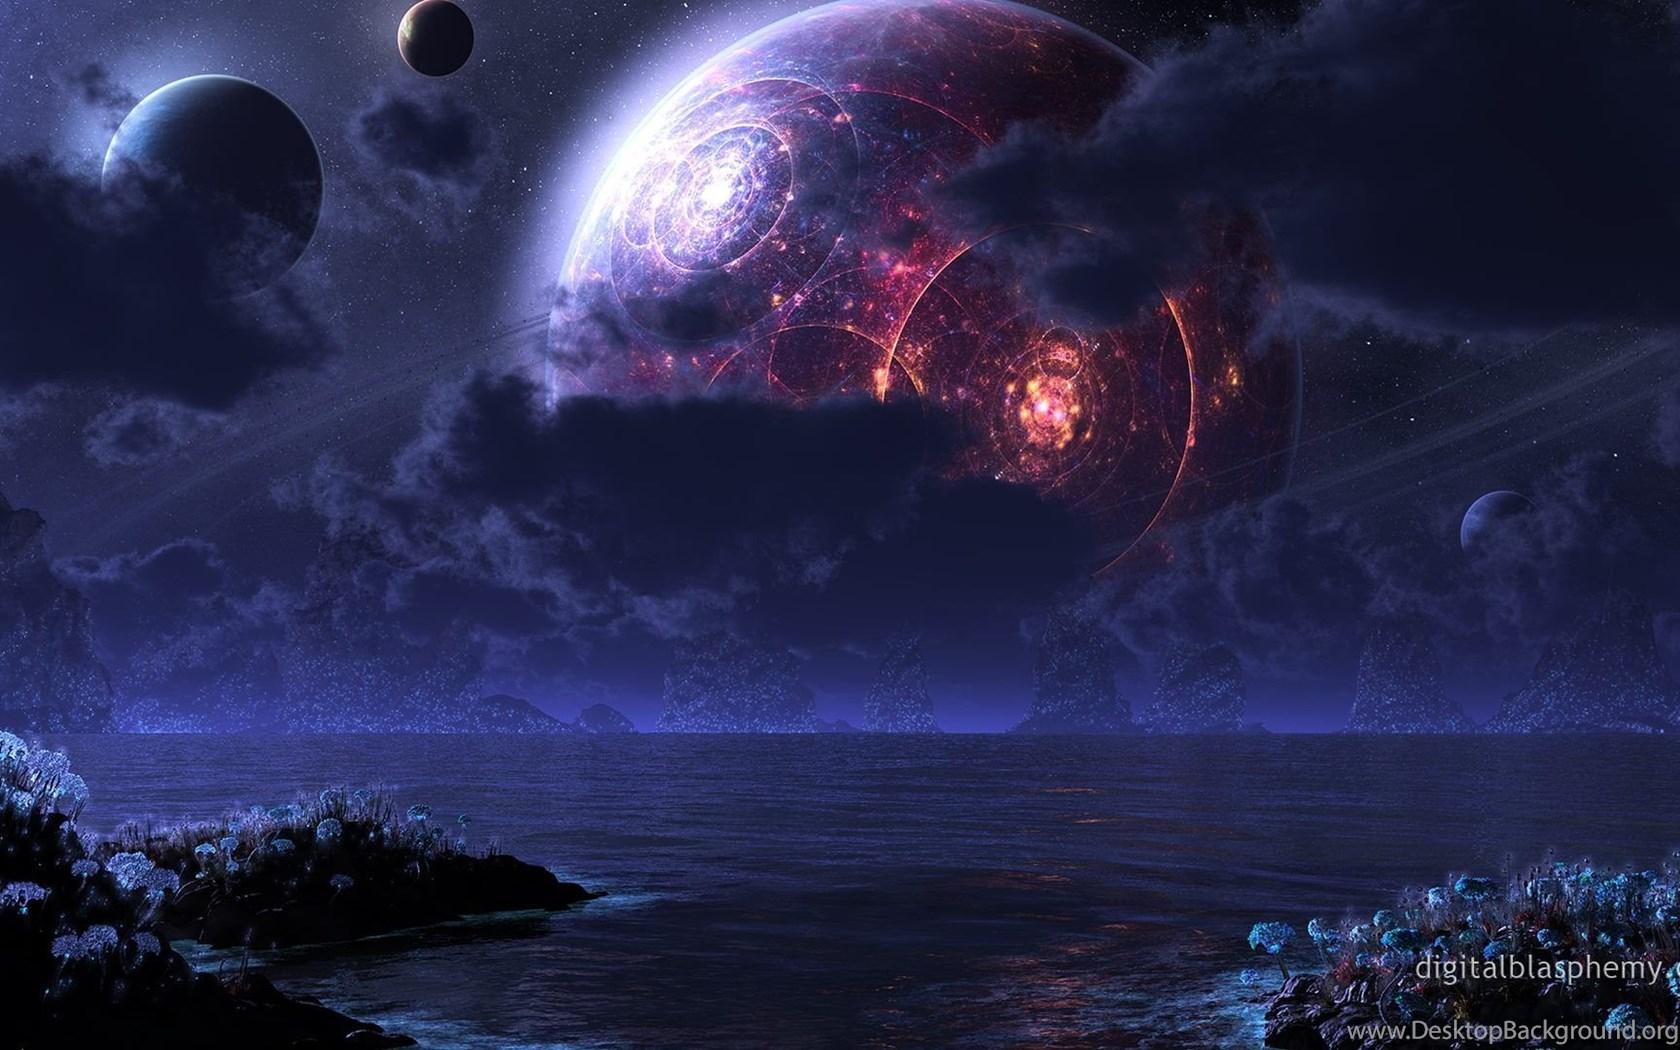 Digital blasphemy 3d wallpaper phraxis moon by ryan bliss - Ryan name wallpaper ...